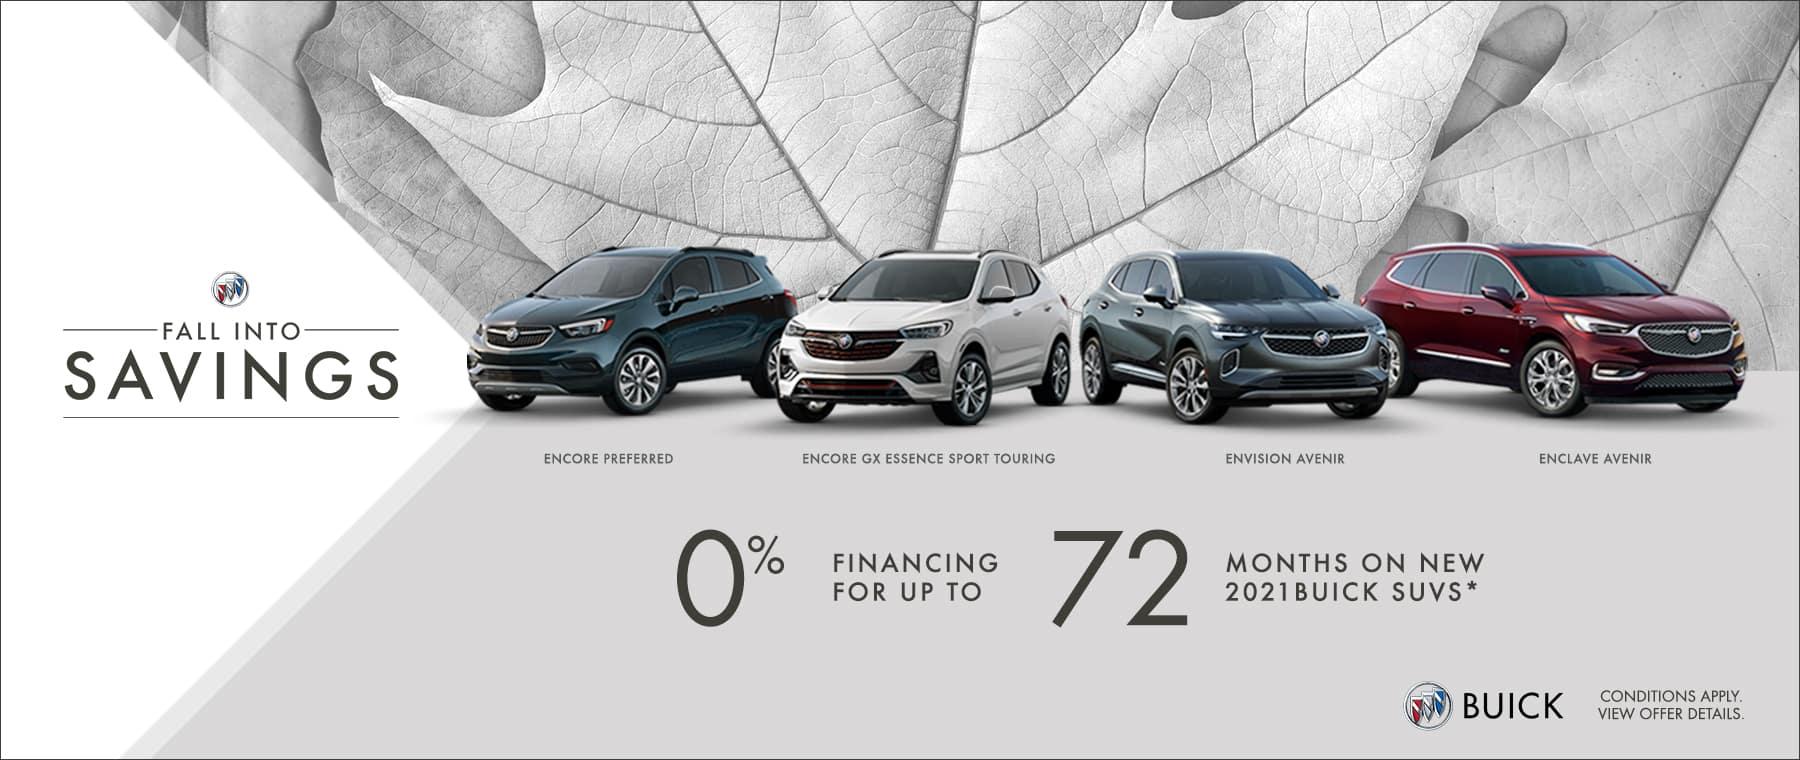 Fall Into Savings - Buick Family